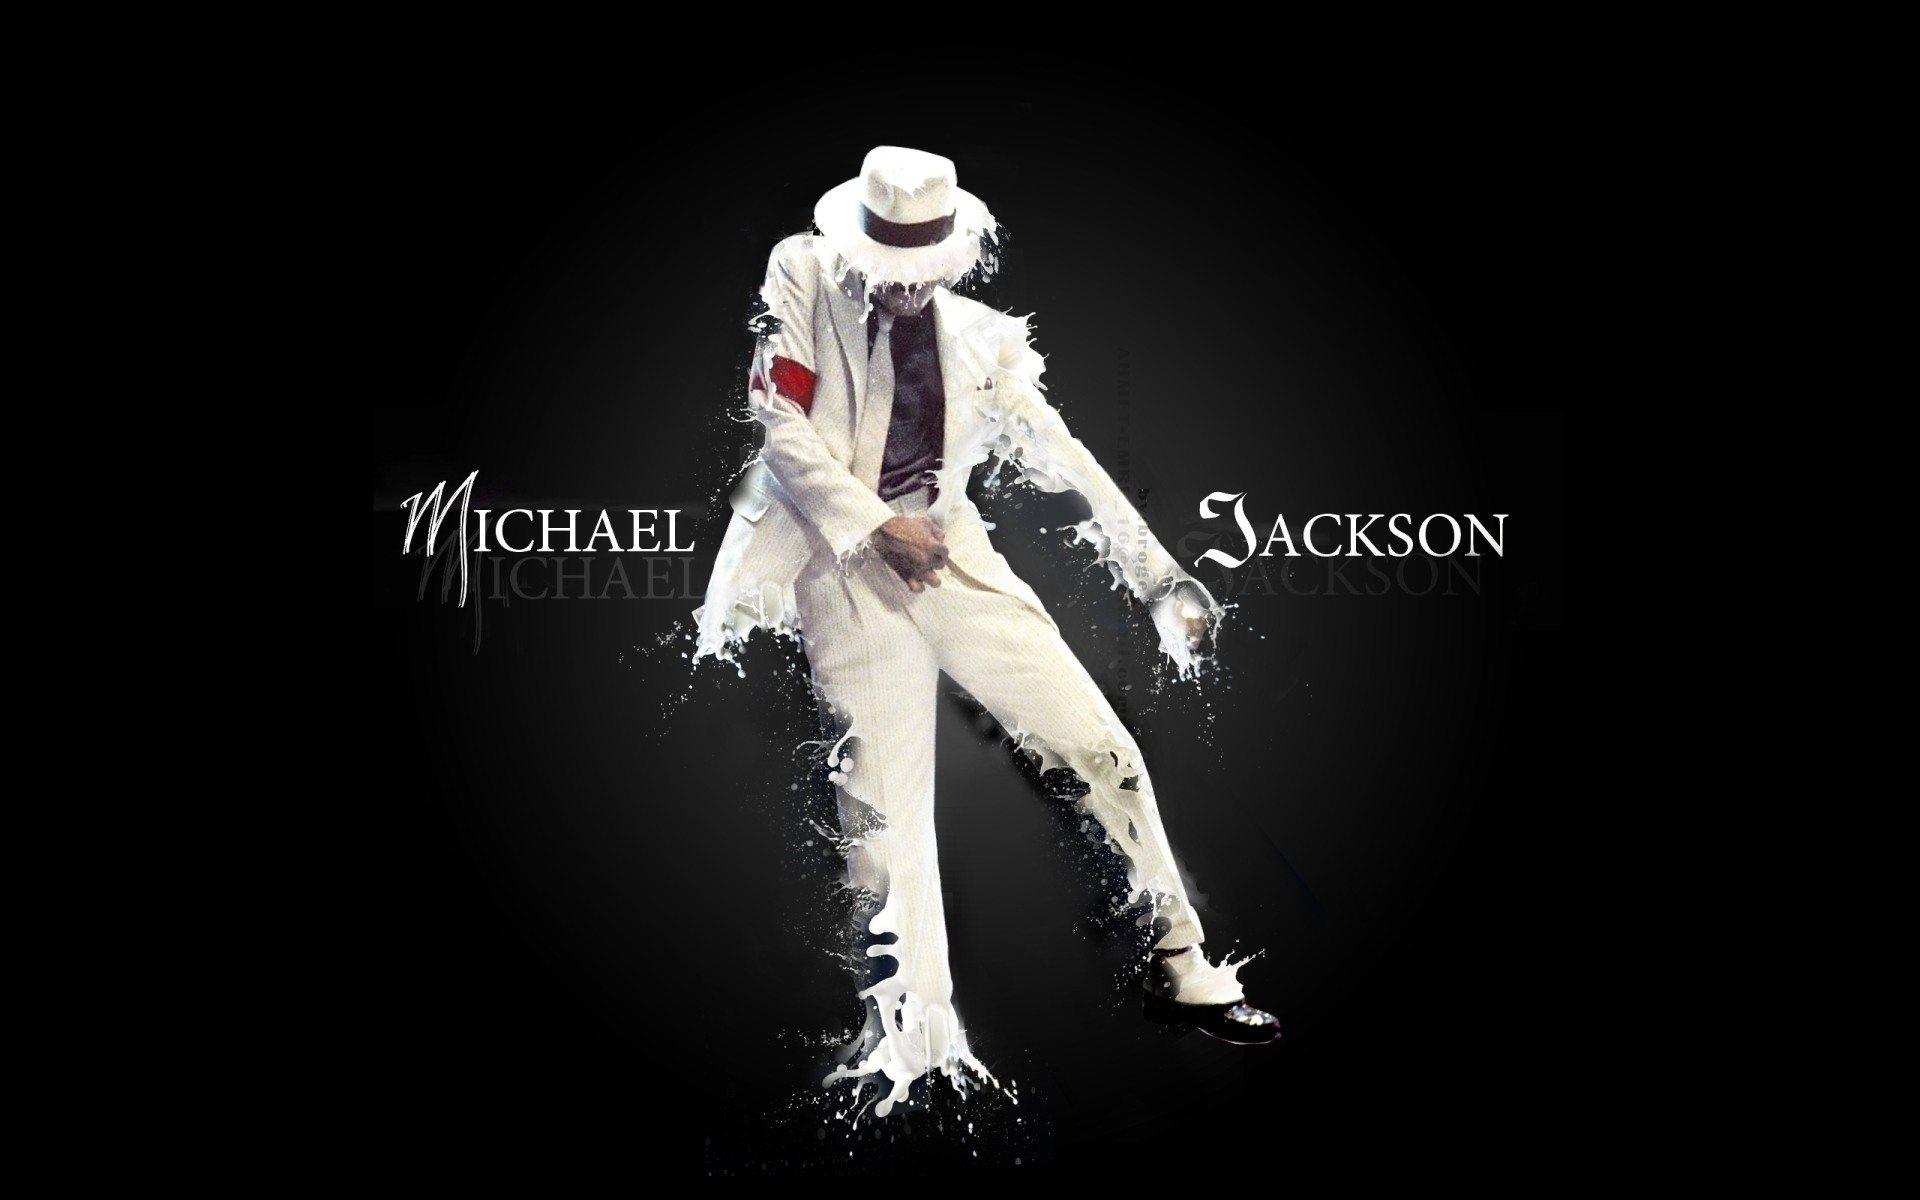 Michael Jackson Suit Dance Letters Spray Wallpaper Hd Wallpapers